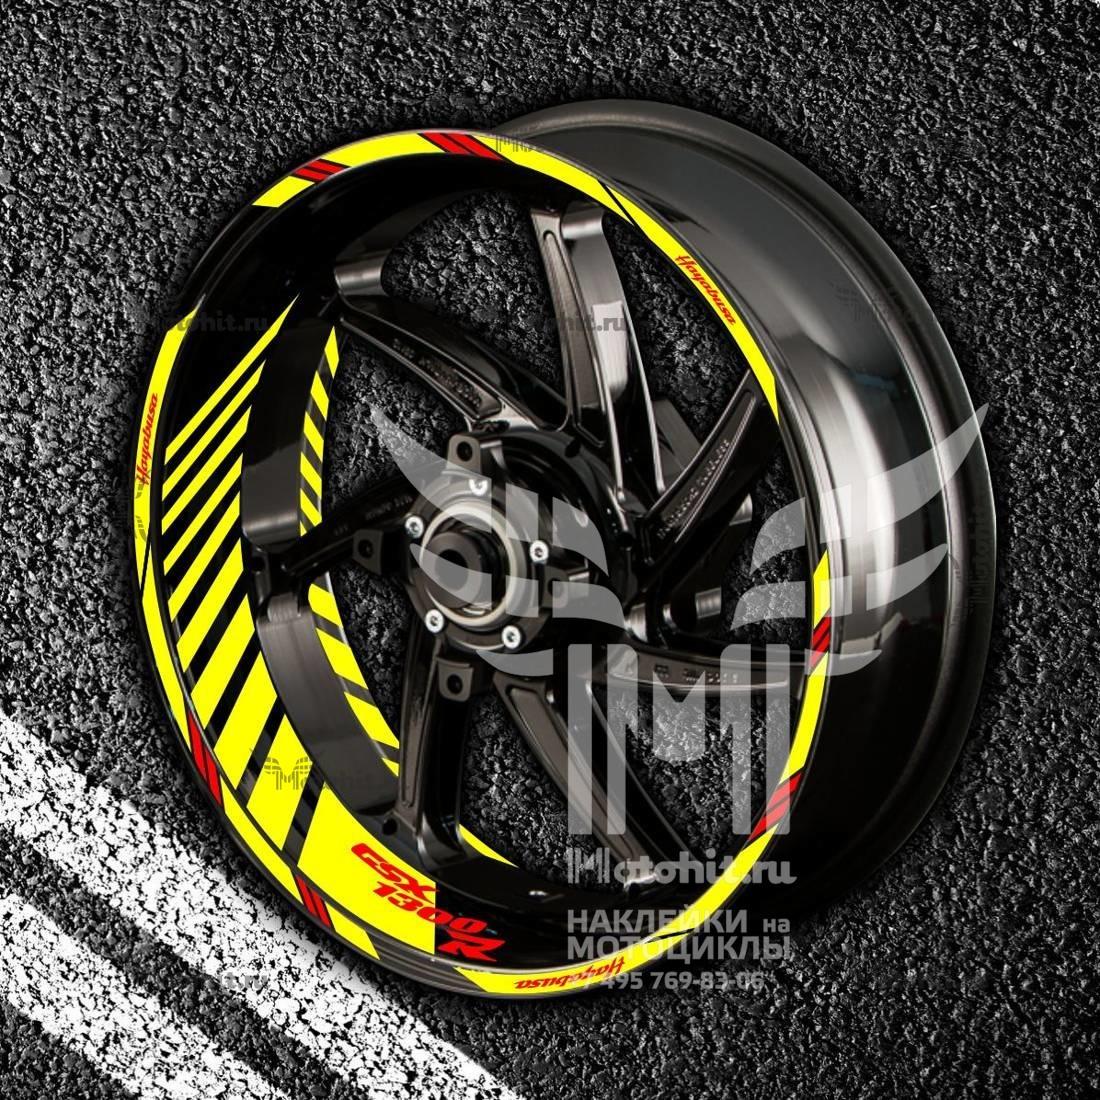 Комплект наклеек с полосами на колеса мотоцикла SUZUKI GSX-1300-R